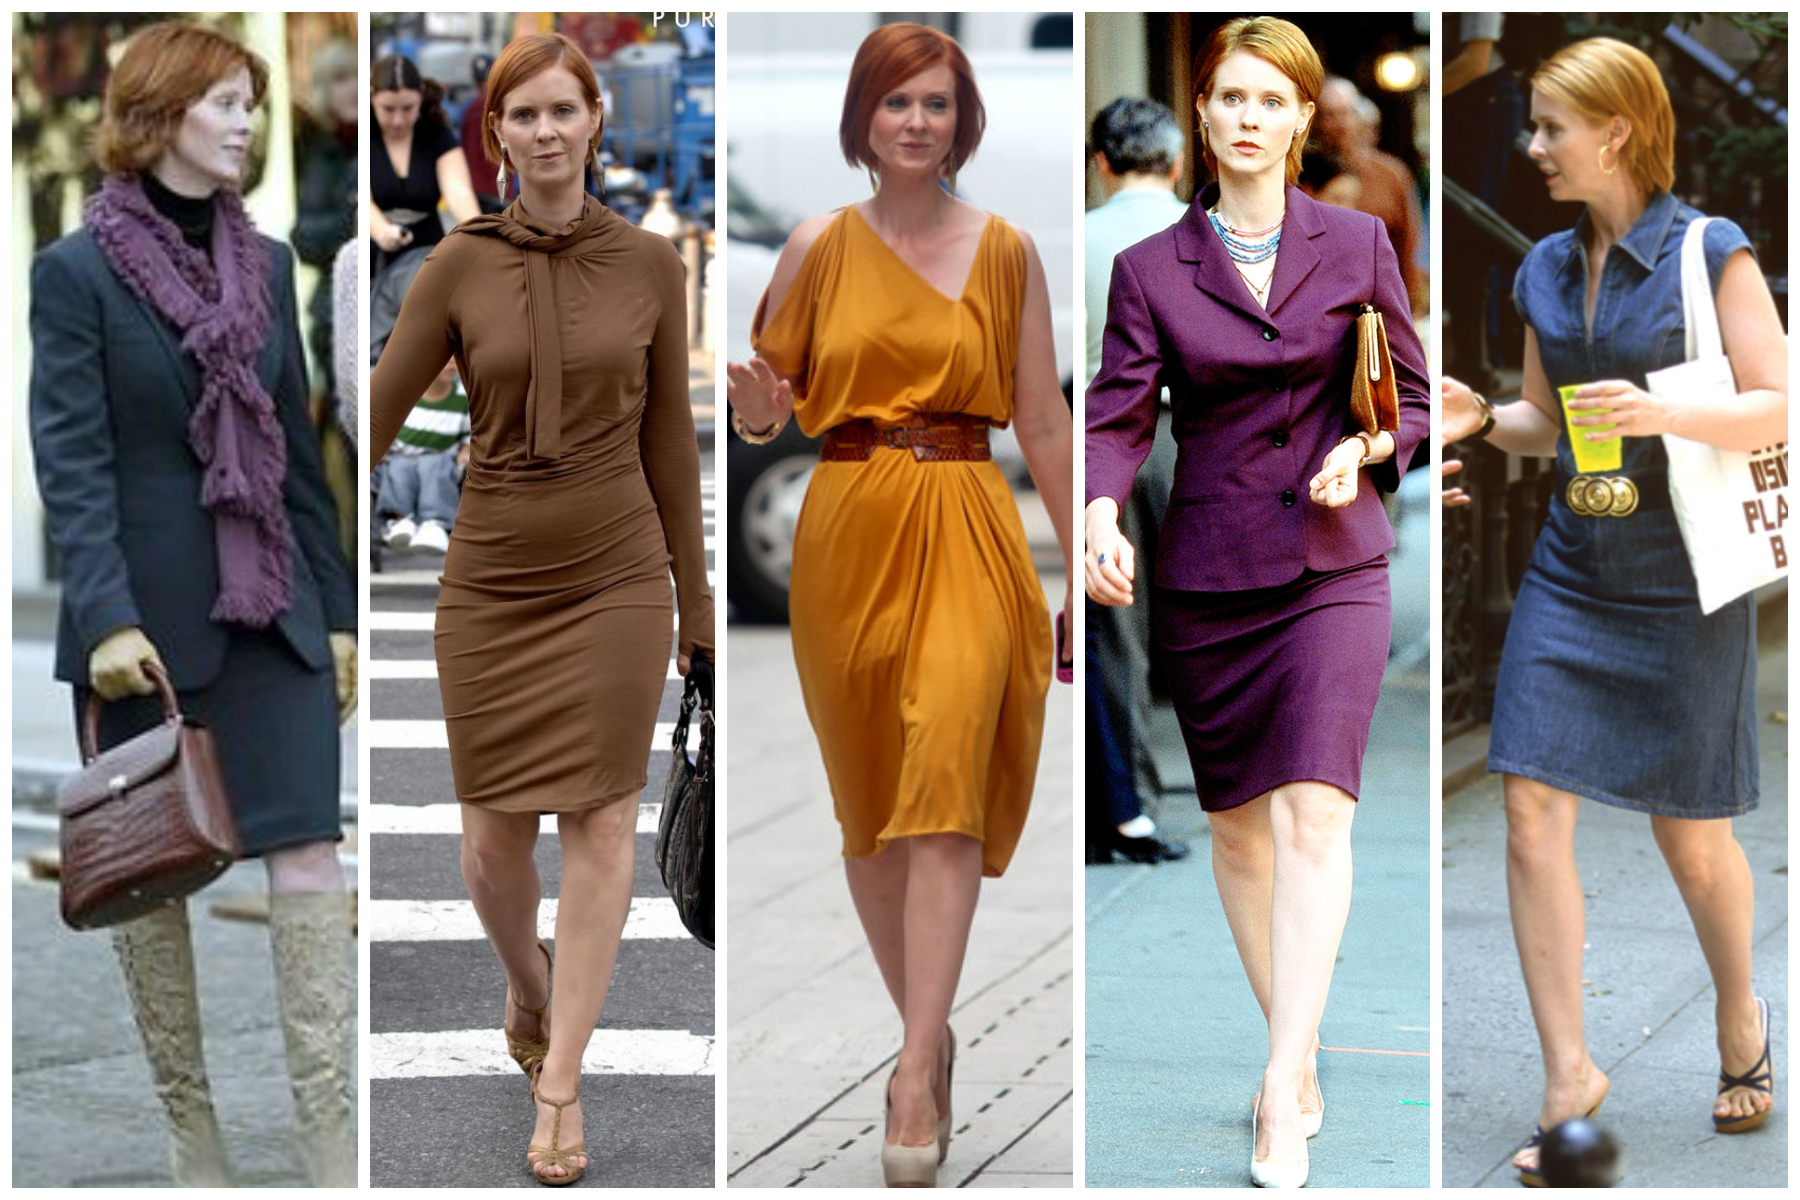 Miranda's Outfits